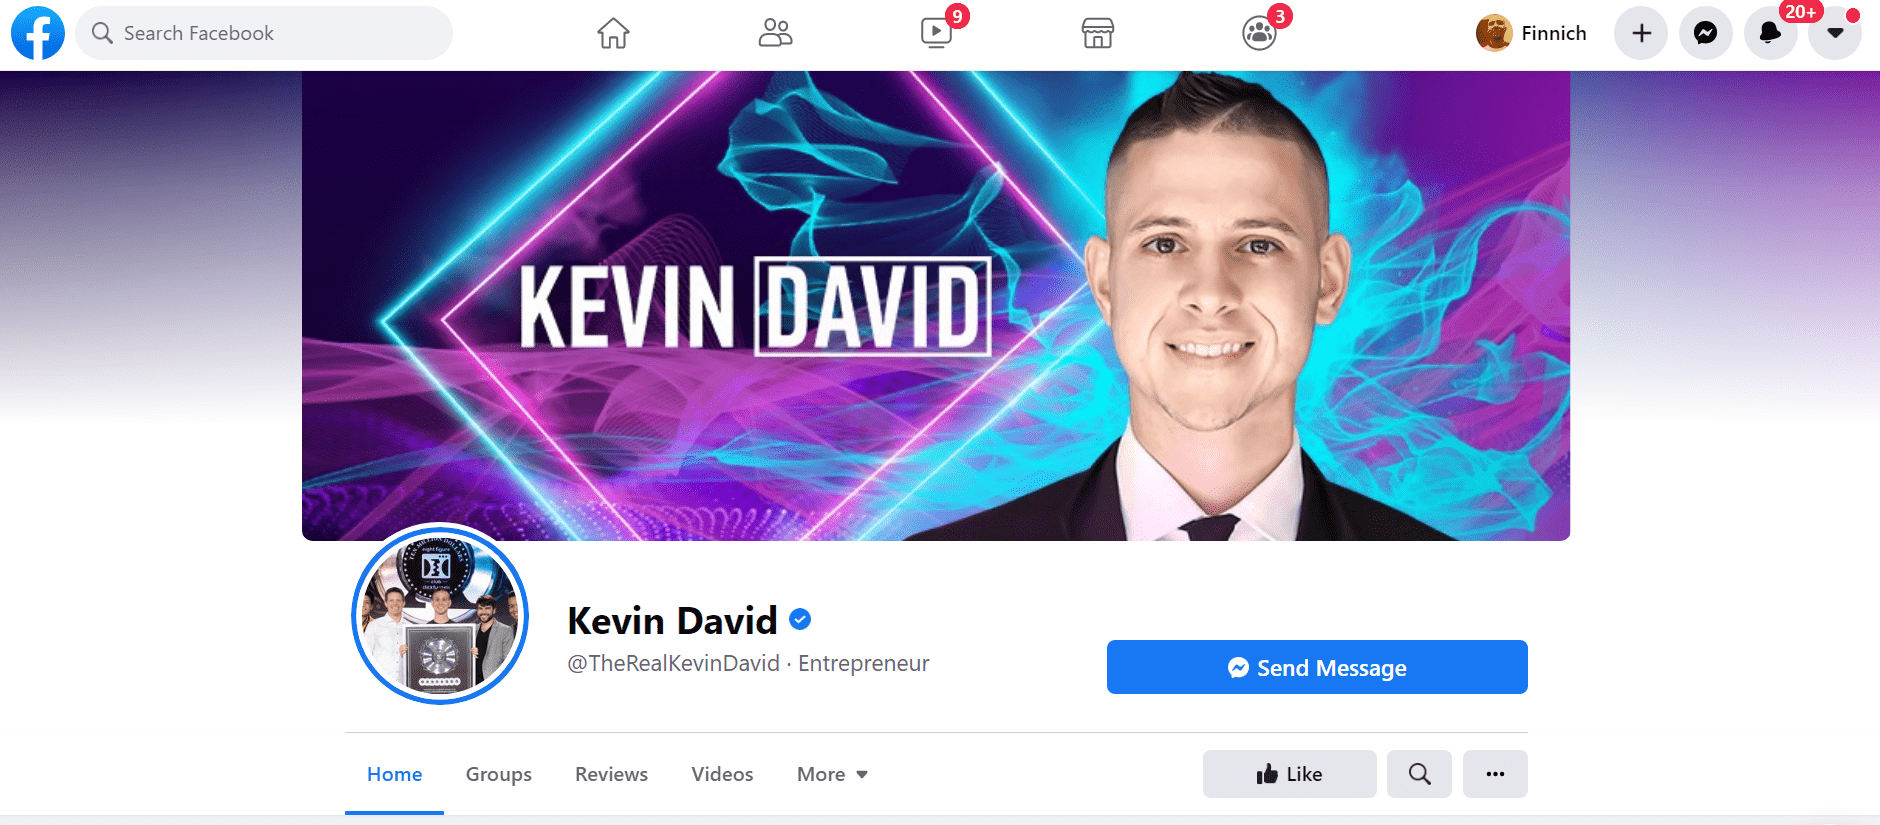 kevin david facebook